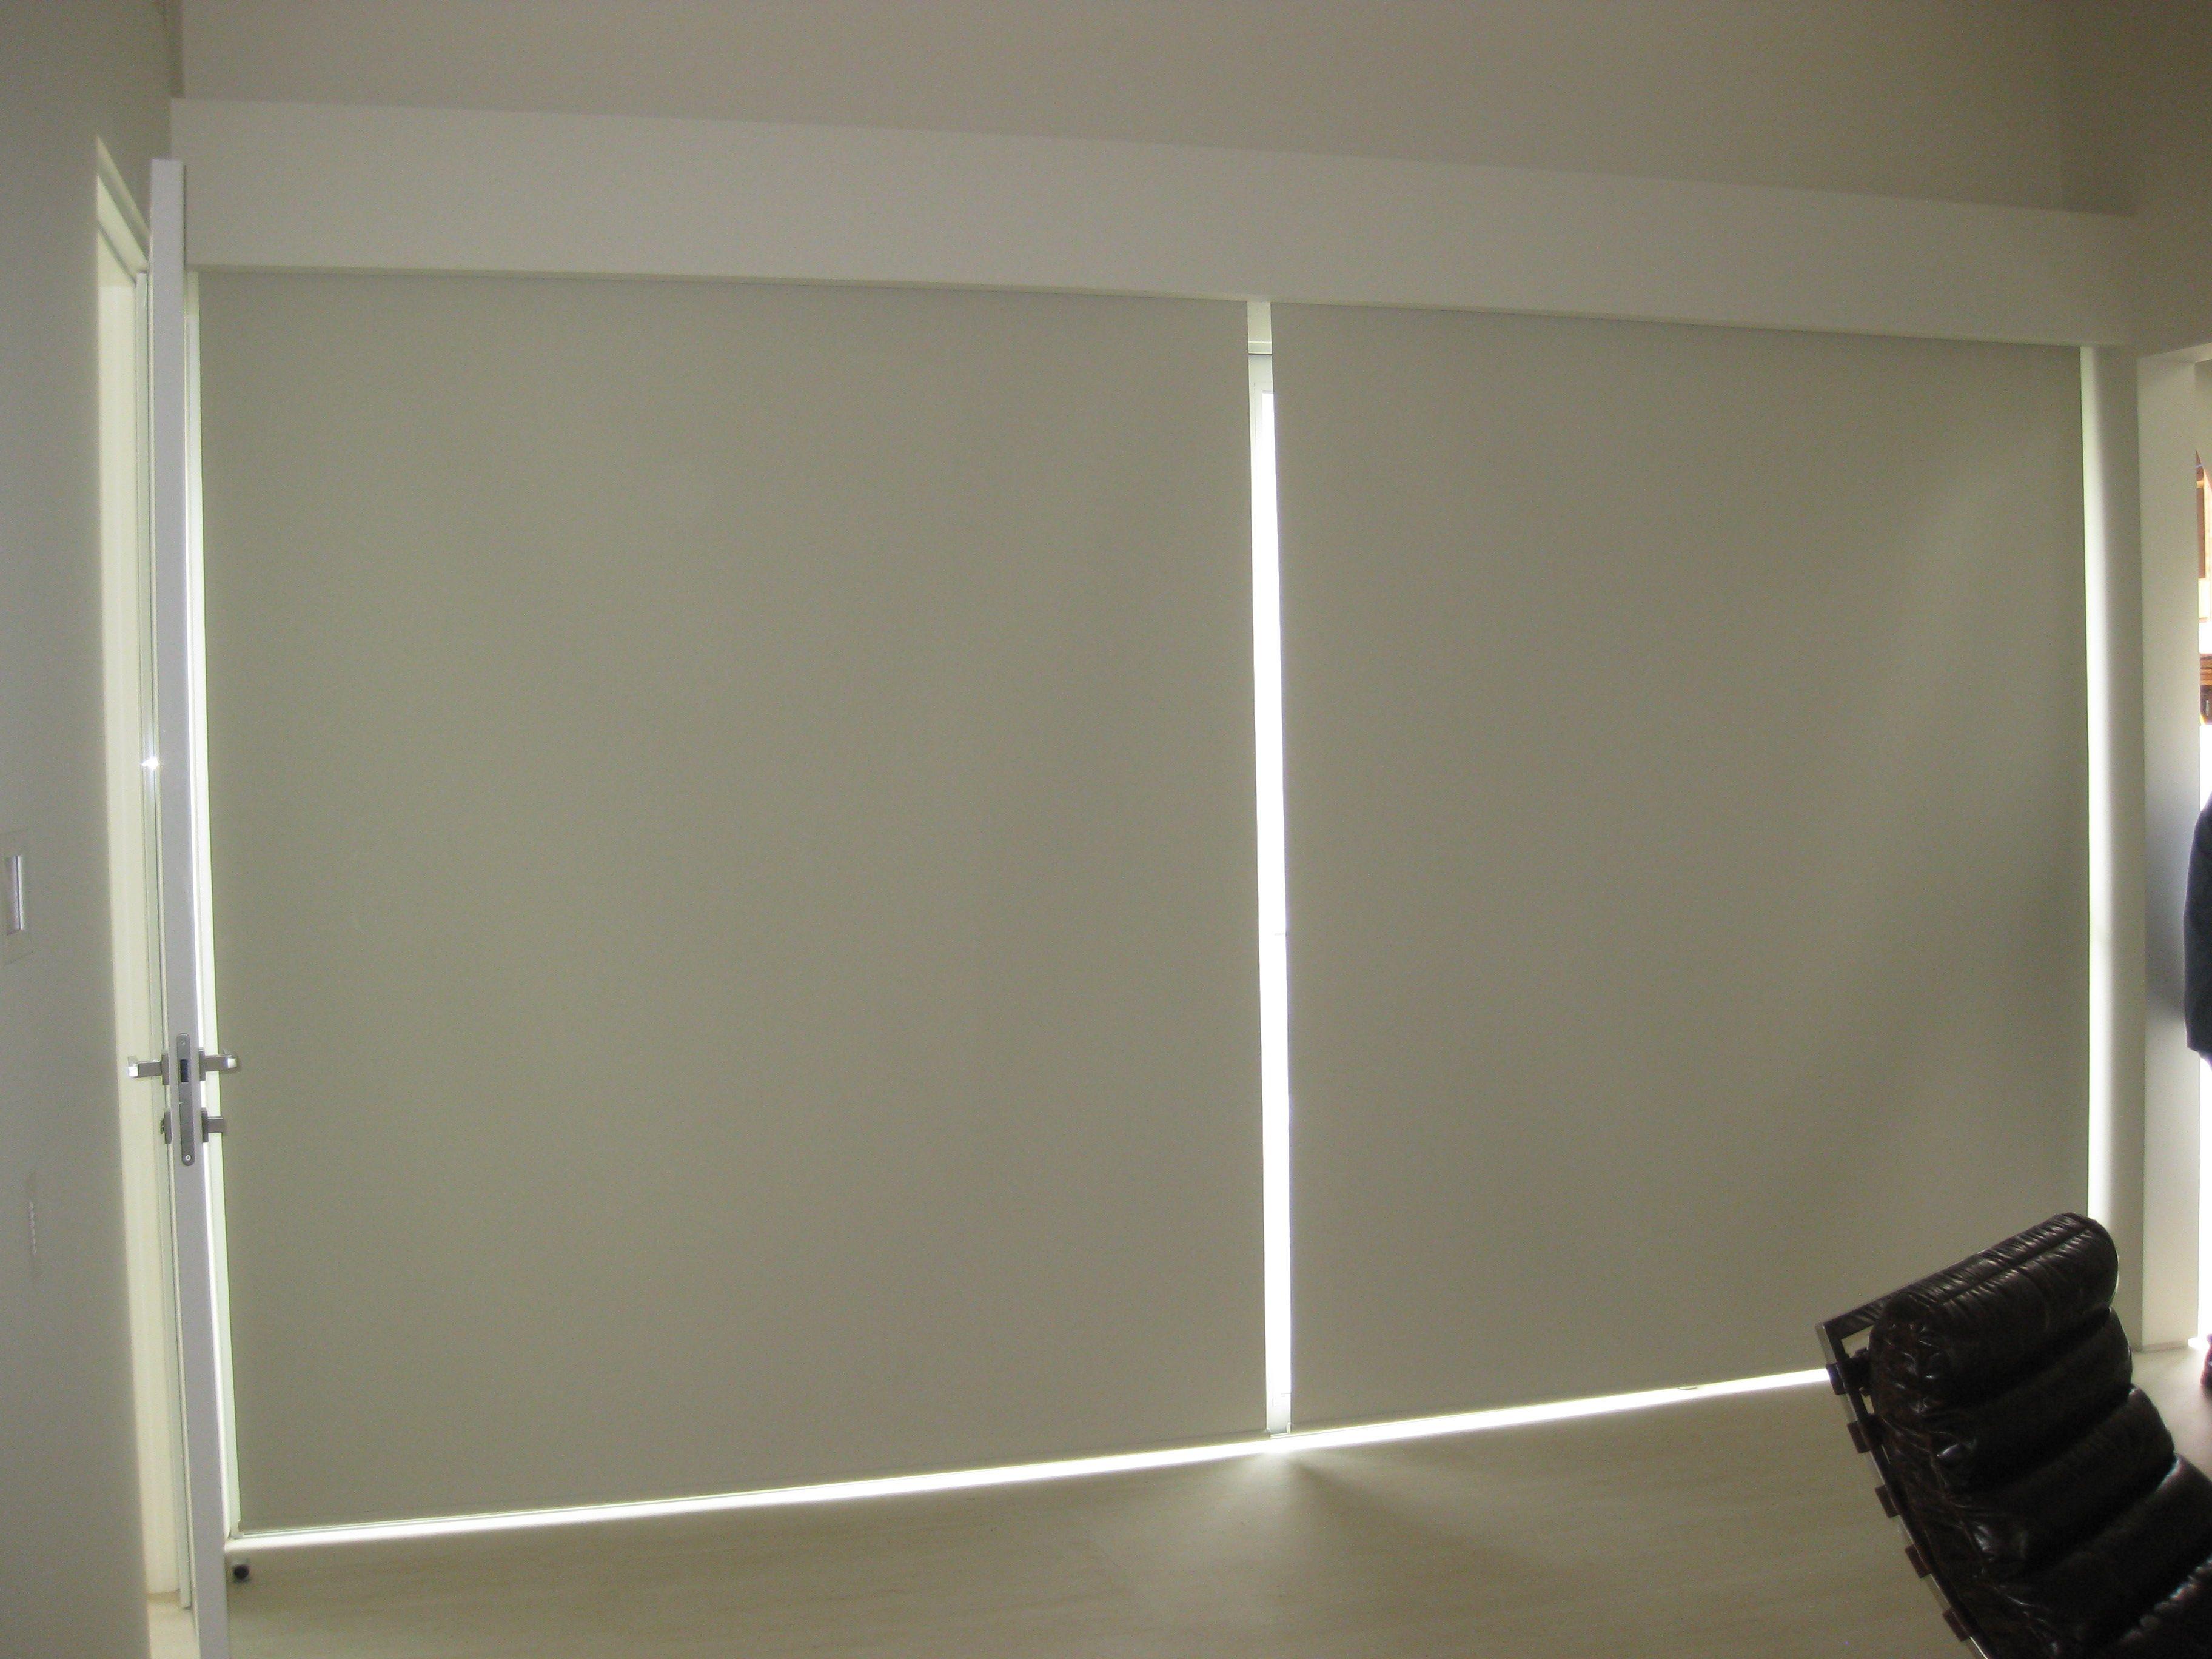 Blackout Roller Shades For Sliding Glass Doors Home Blackout Shades Shades Blinds Sliding Glass Door